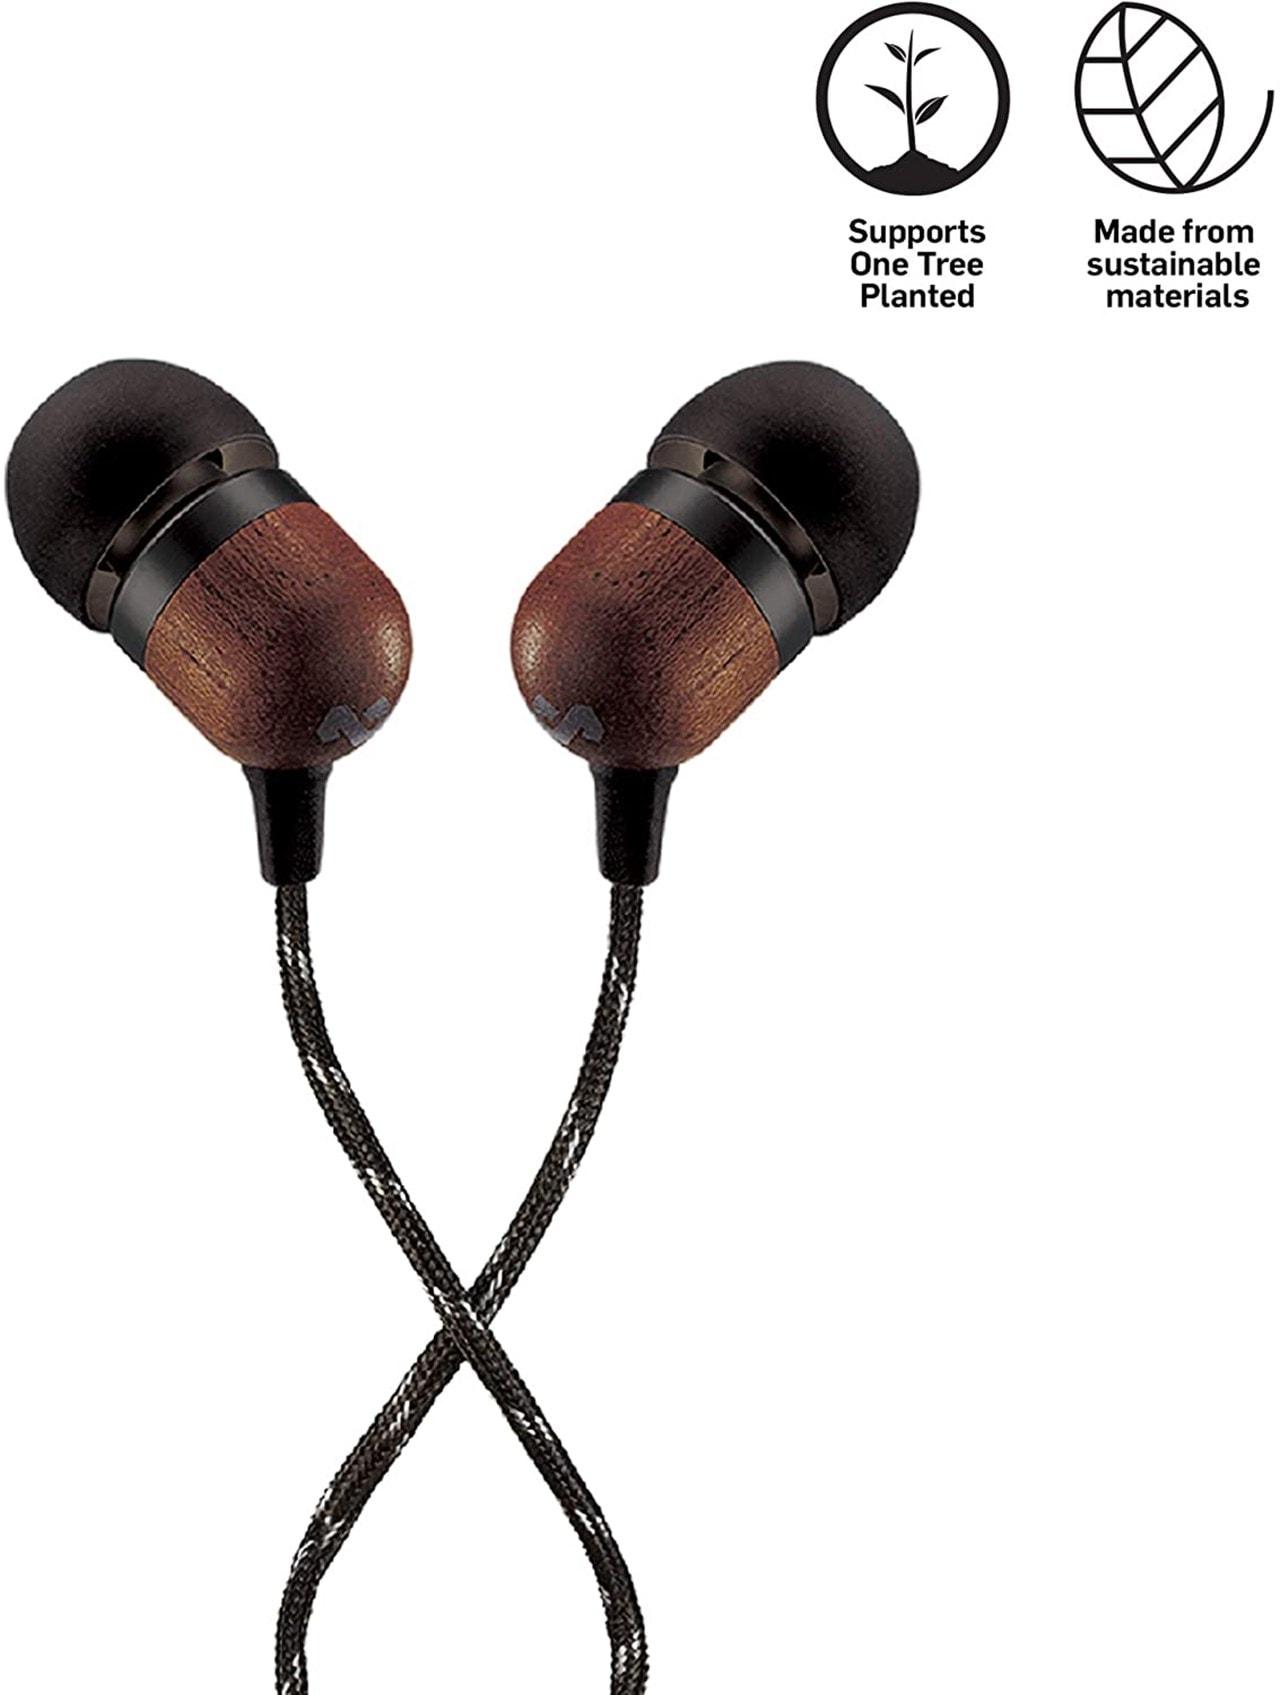 House Of Marley Smile Jamaica Signature Black Earphones W/Mic - 1